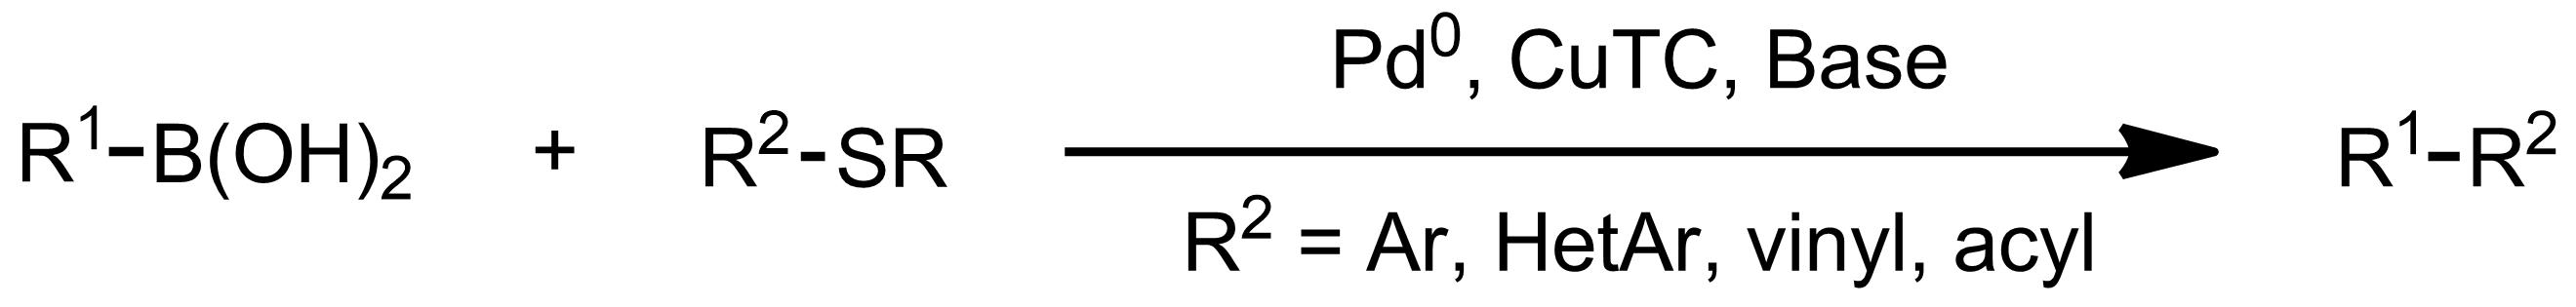 Schematic representation of the Liebeskind-Srogl Coupling.